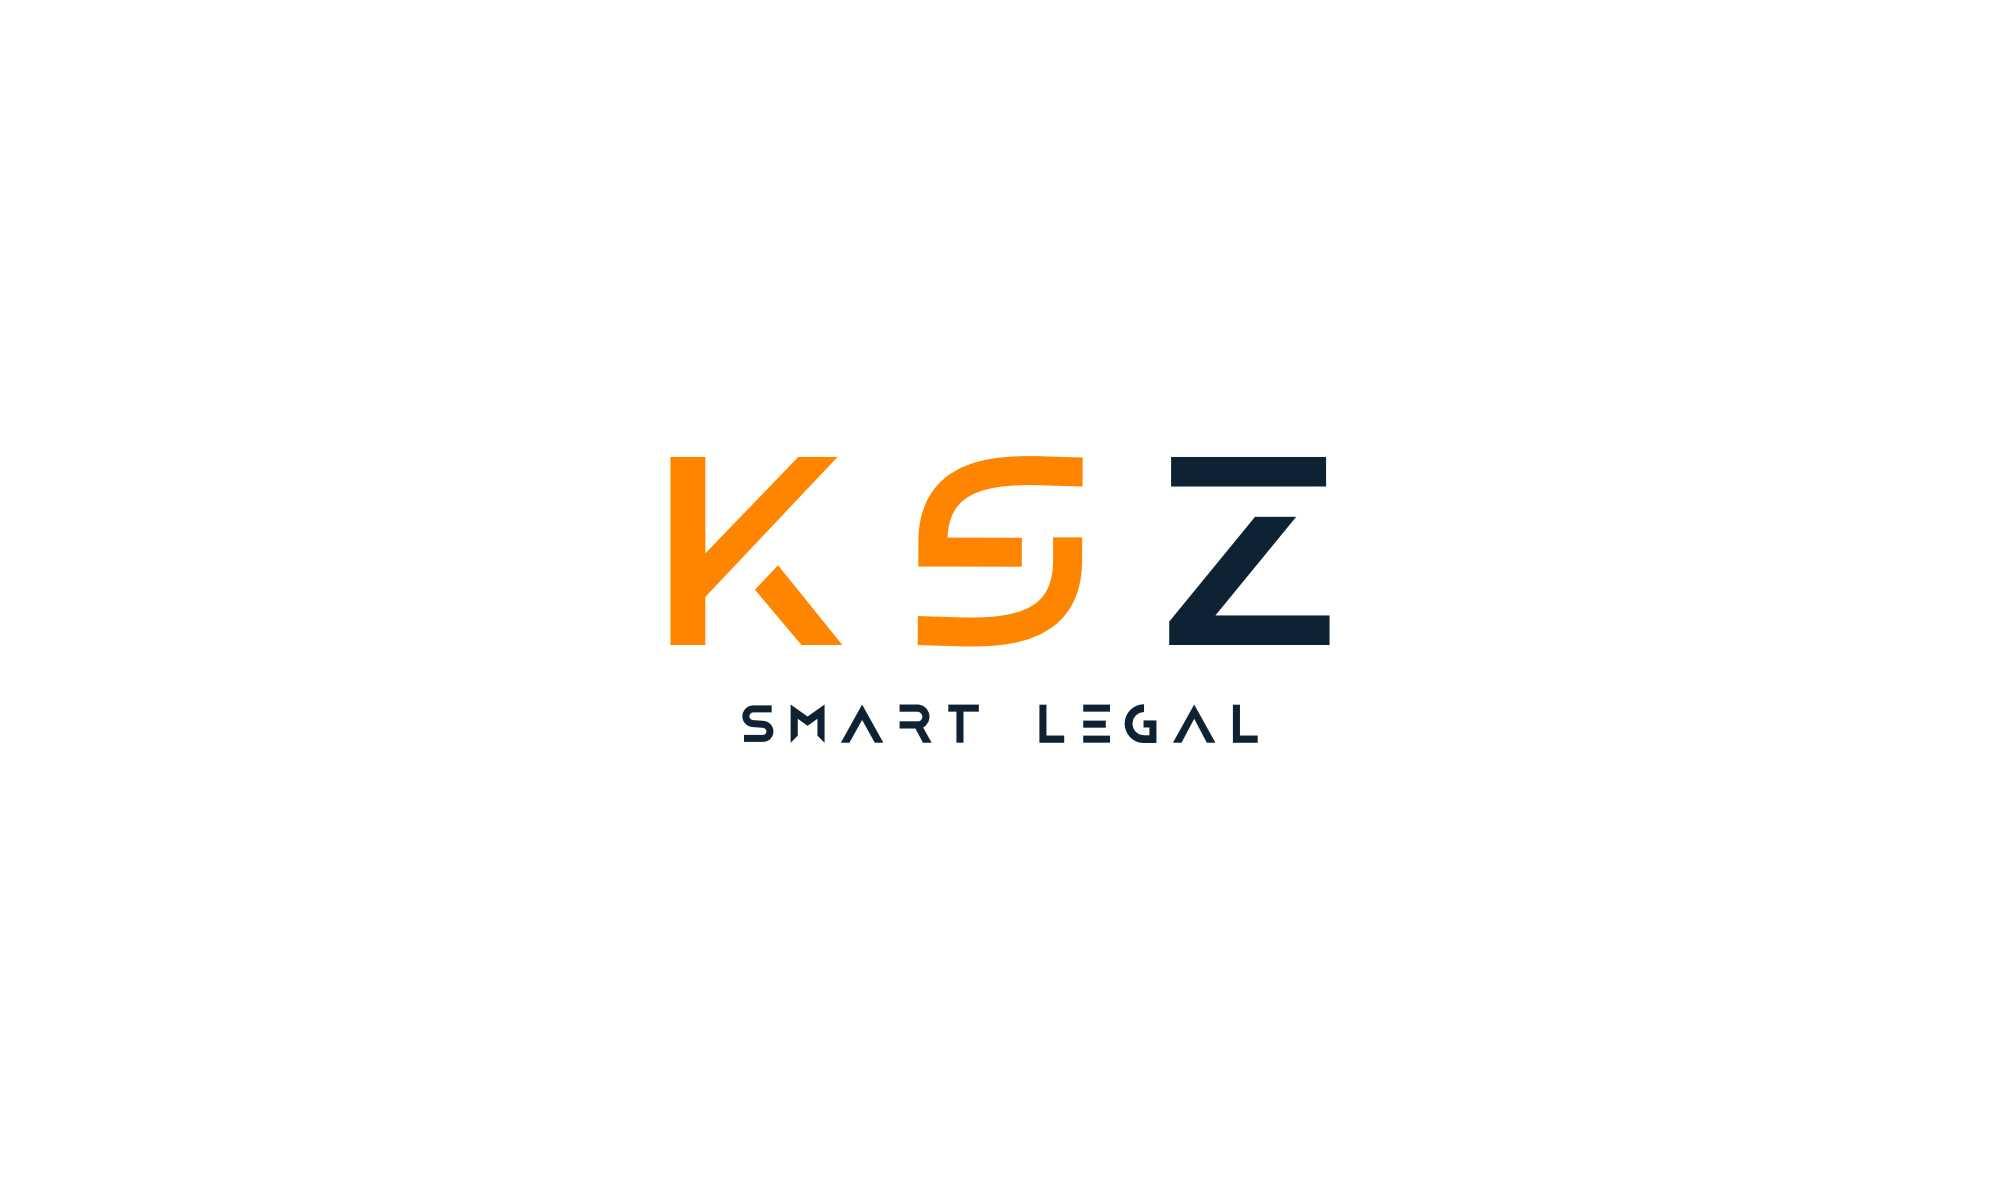 KSZ Smart Legal